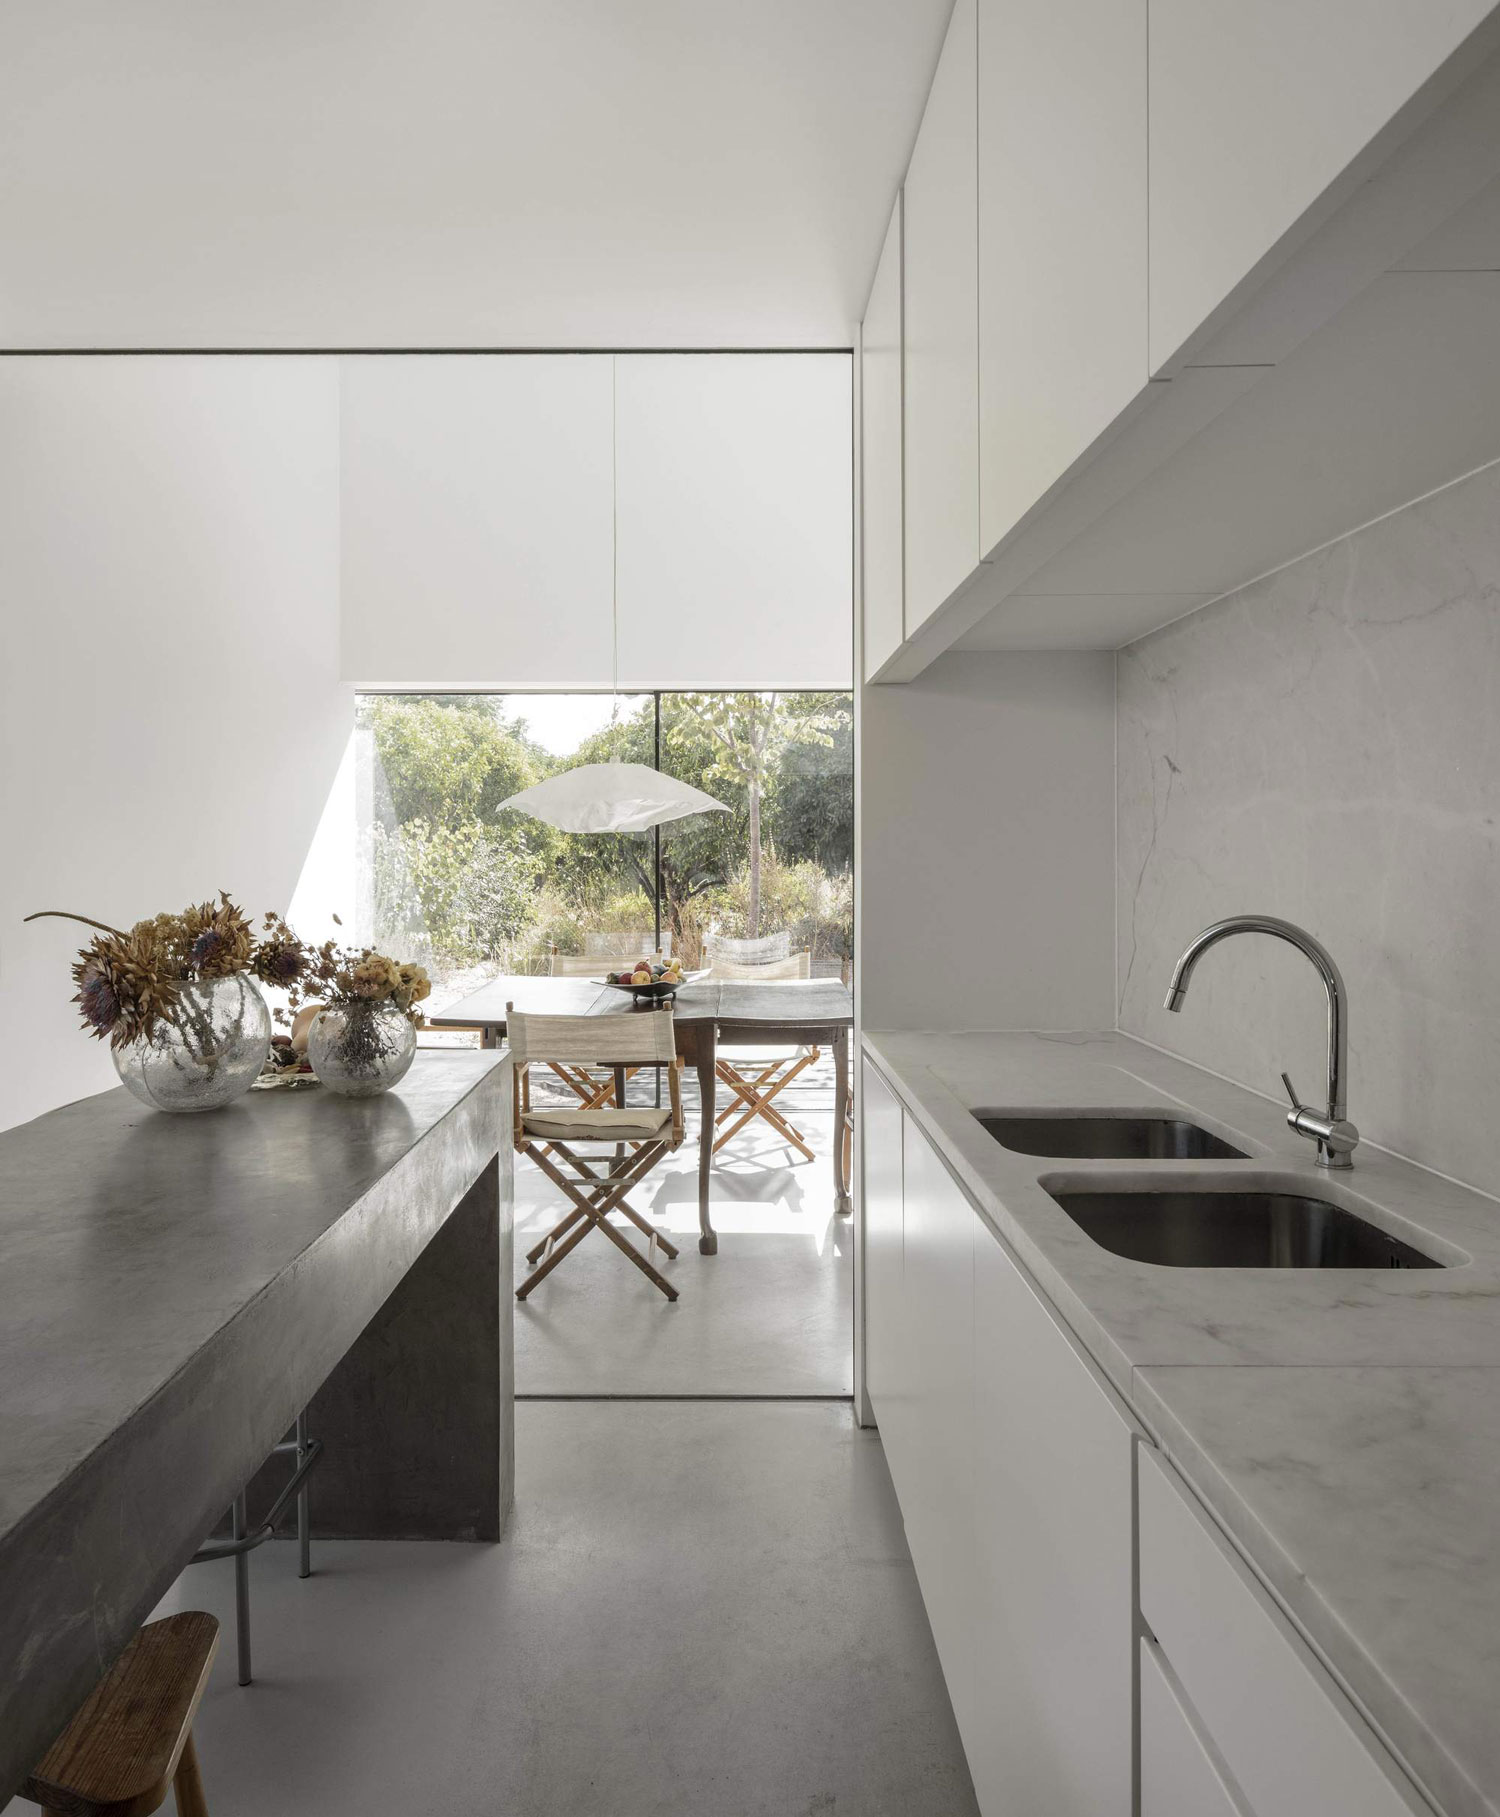 konyhasziget_minimal_haz_portugaliabol_red-house-in-setubal-portugal-by-extrastudio_6.jpg